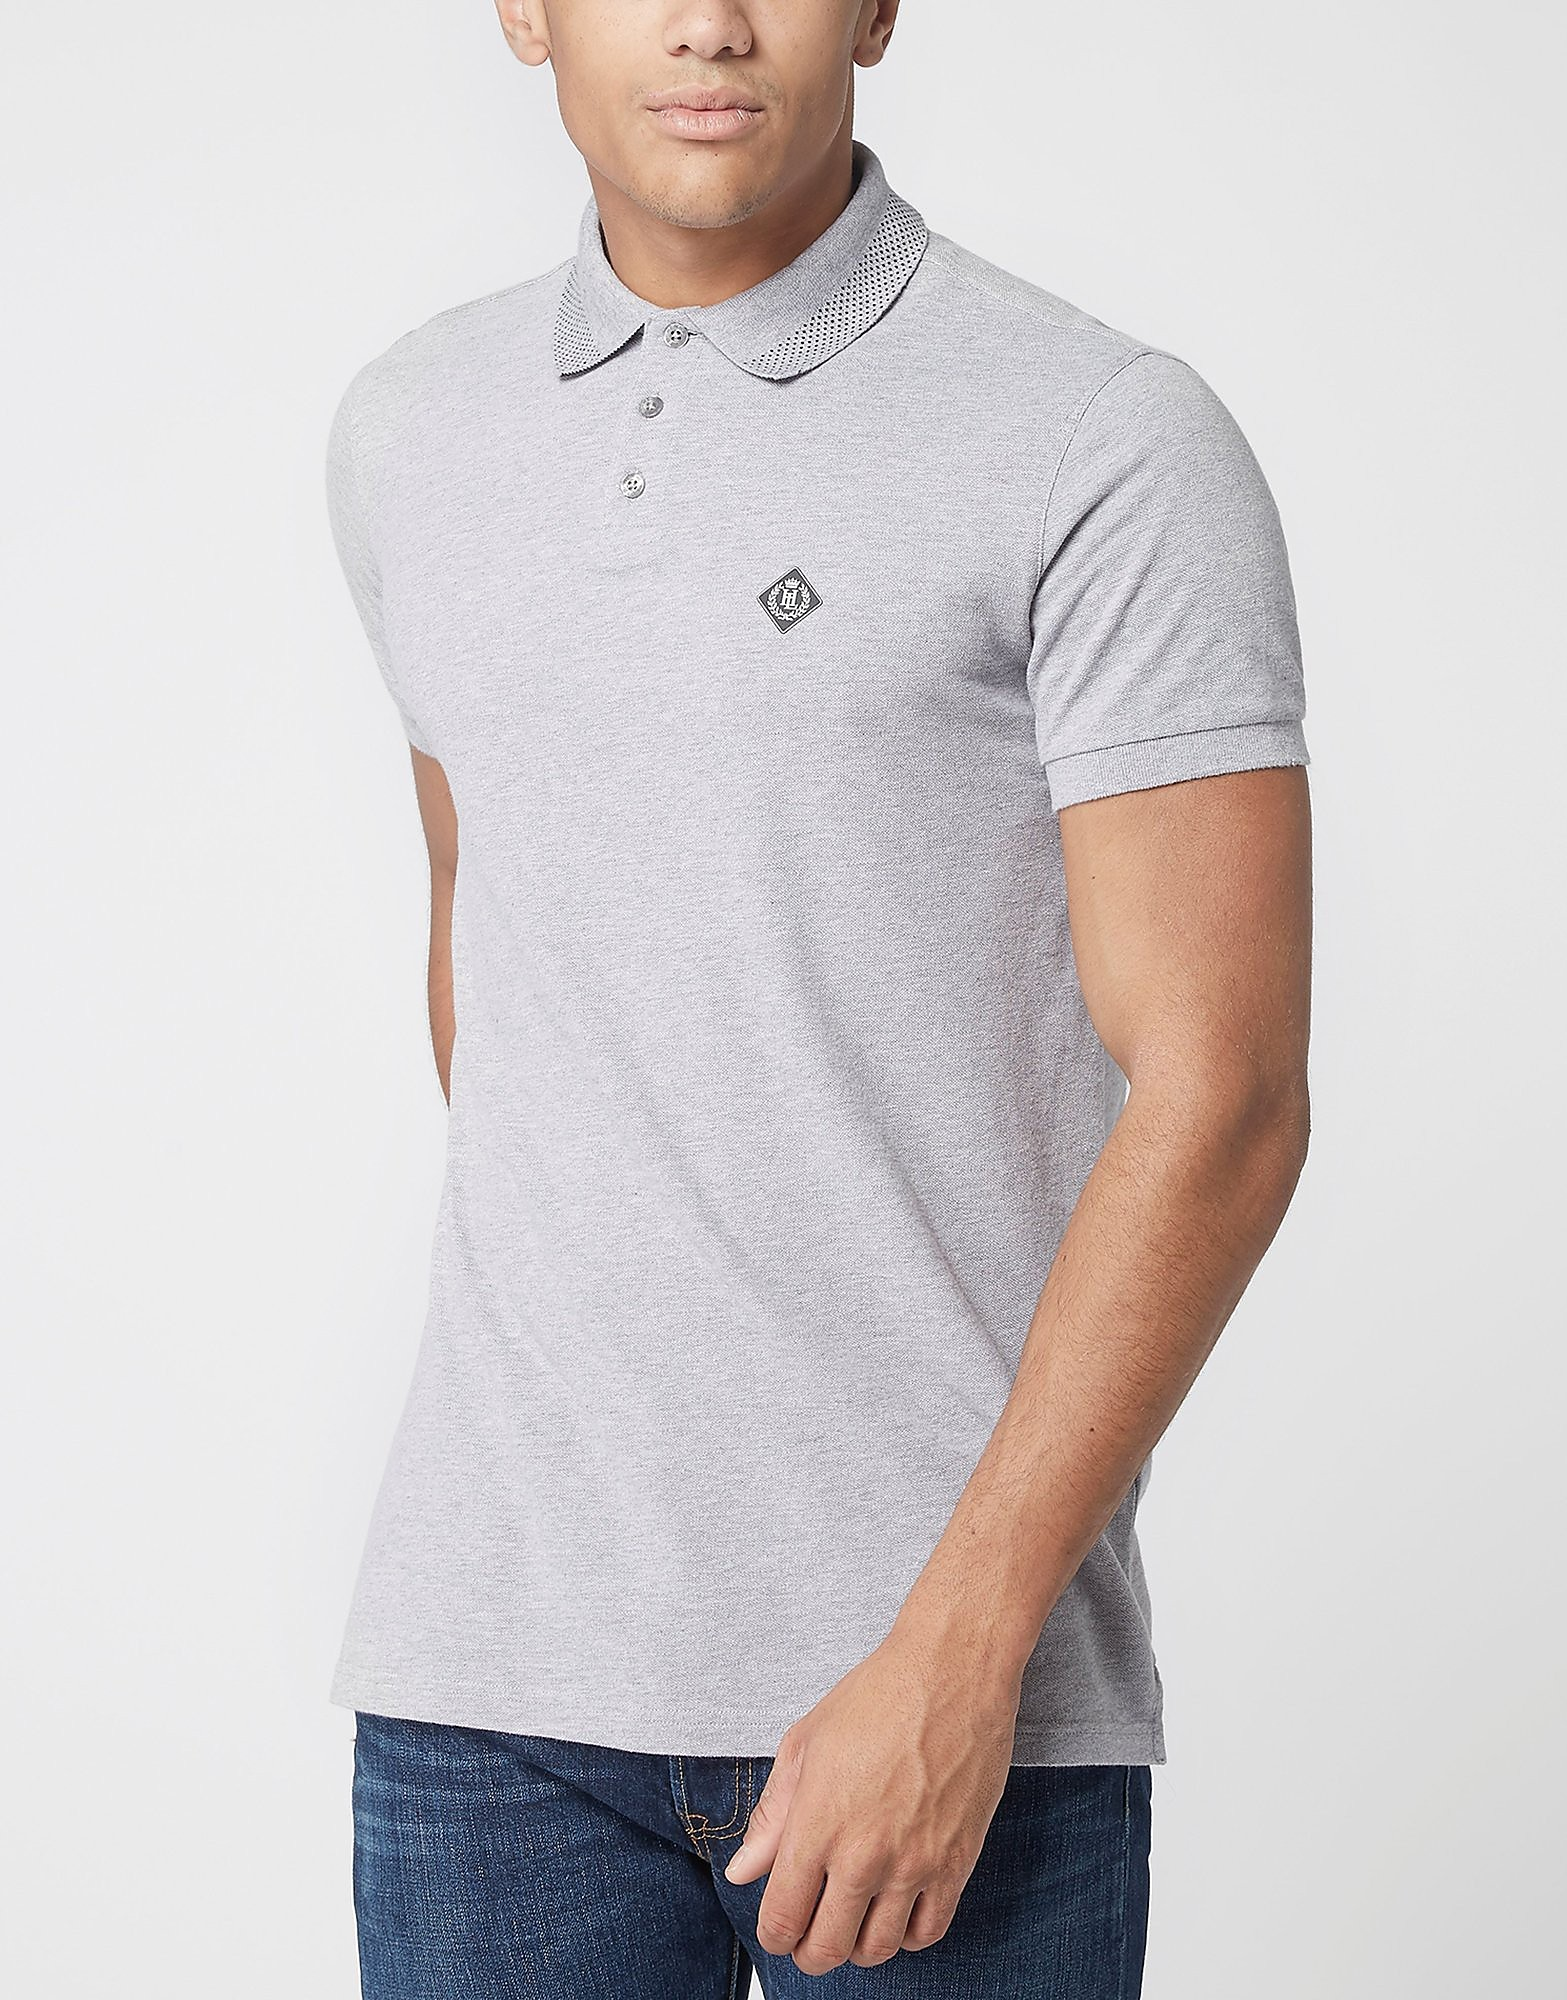 Henri Lloyd Clevis Polo Shirt